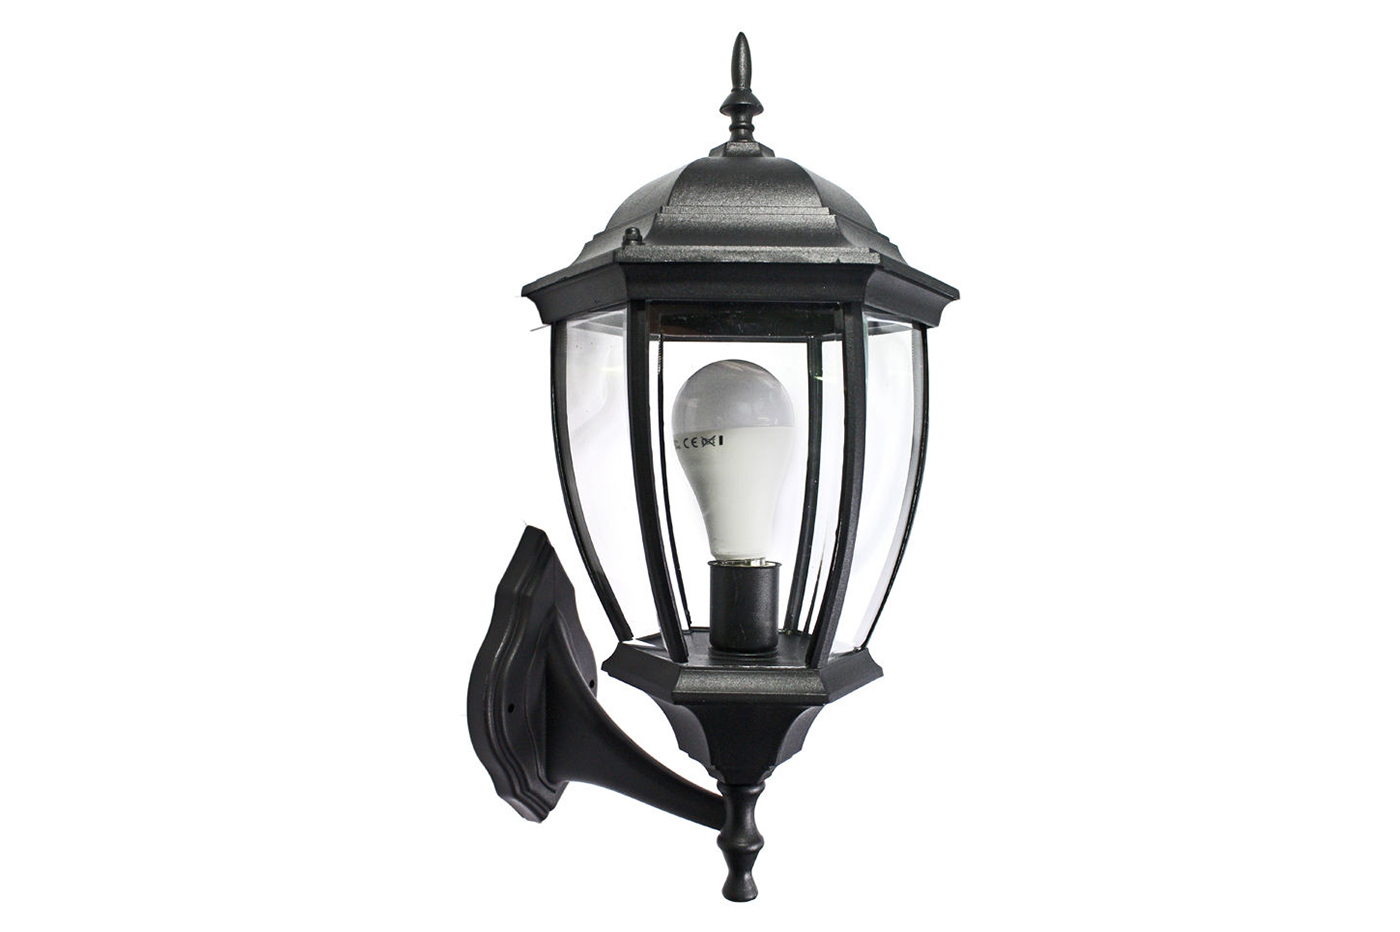 Bes 24867 applique beselettronica applique lampada lanterna